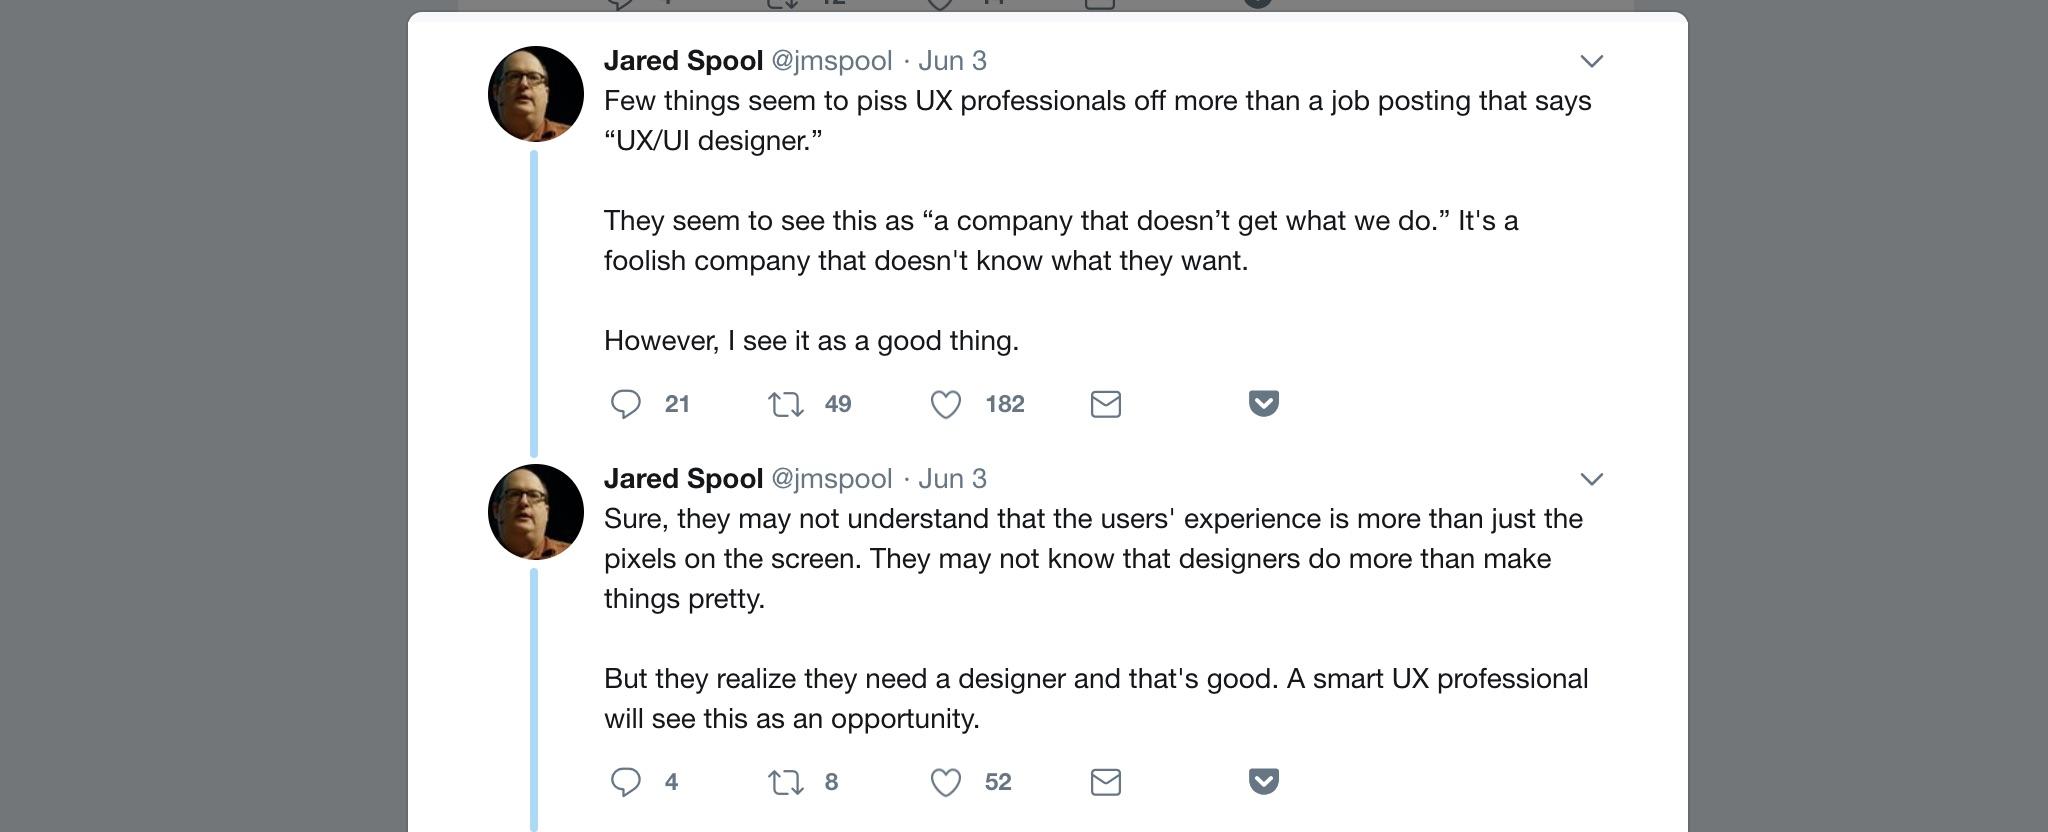 Jared Spool Tweet